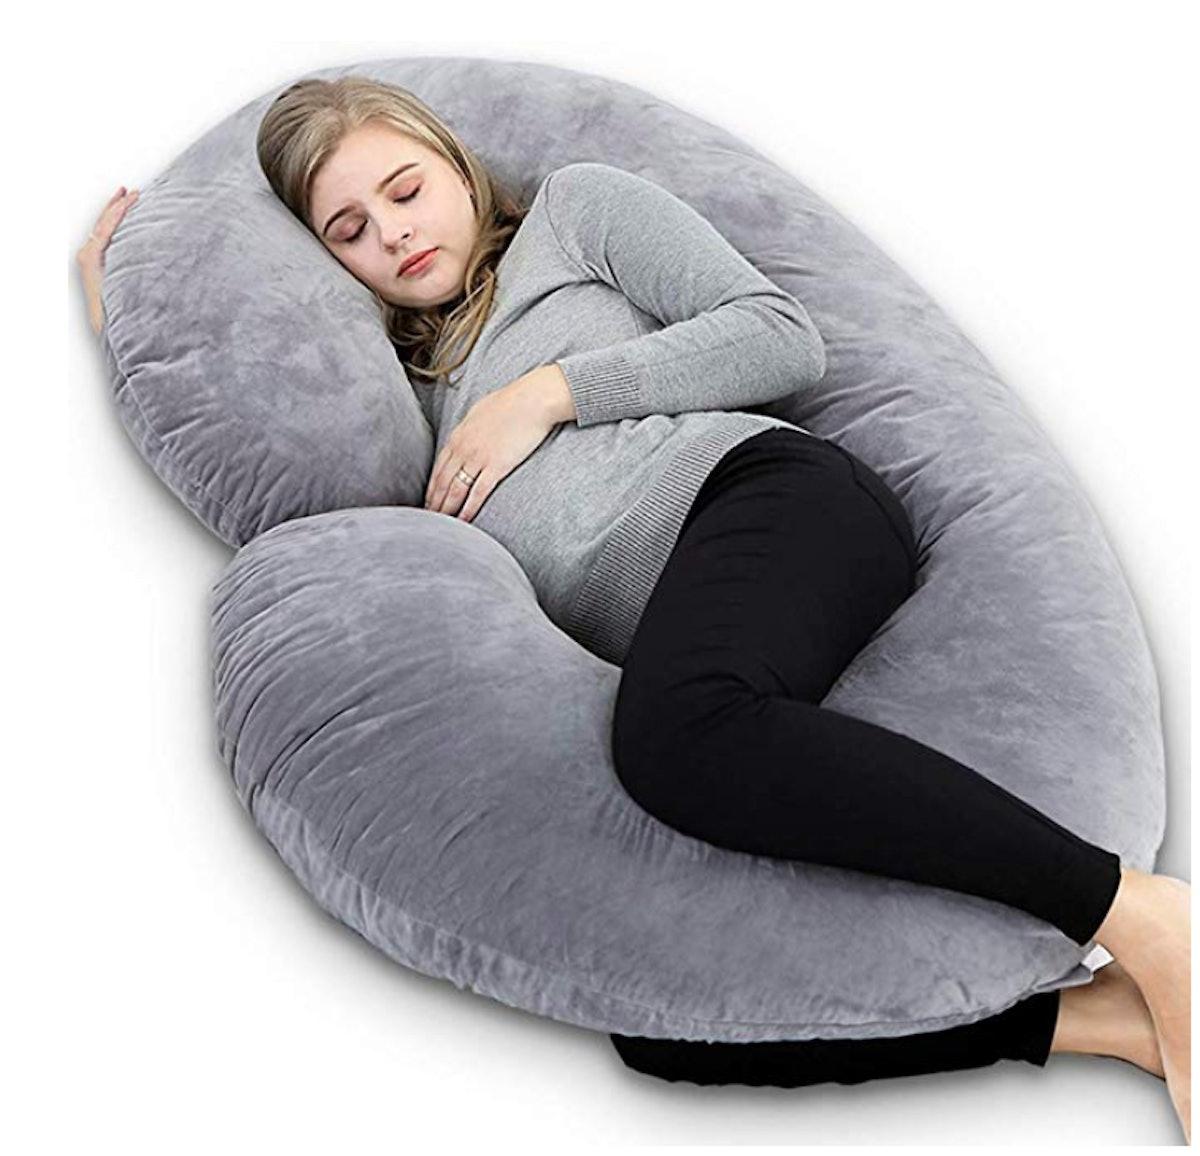 INSEN Pregnancy Body Pillow